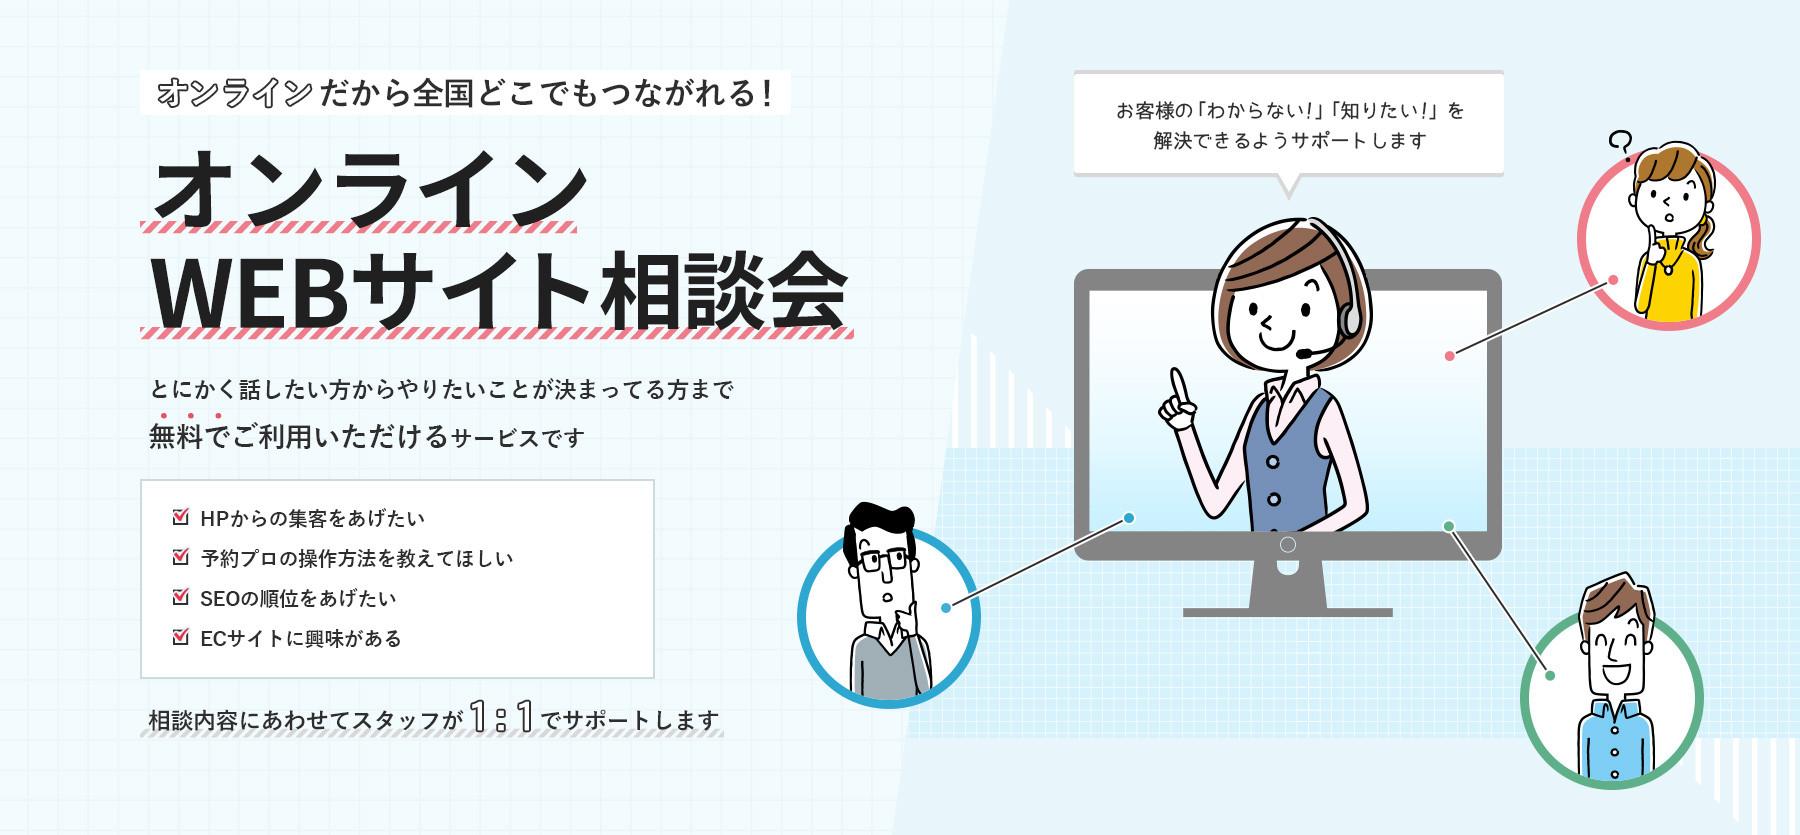 【abilive】WEBサイト制作・WEBサービス オンライン無料相談会 実施中!